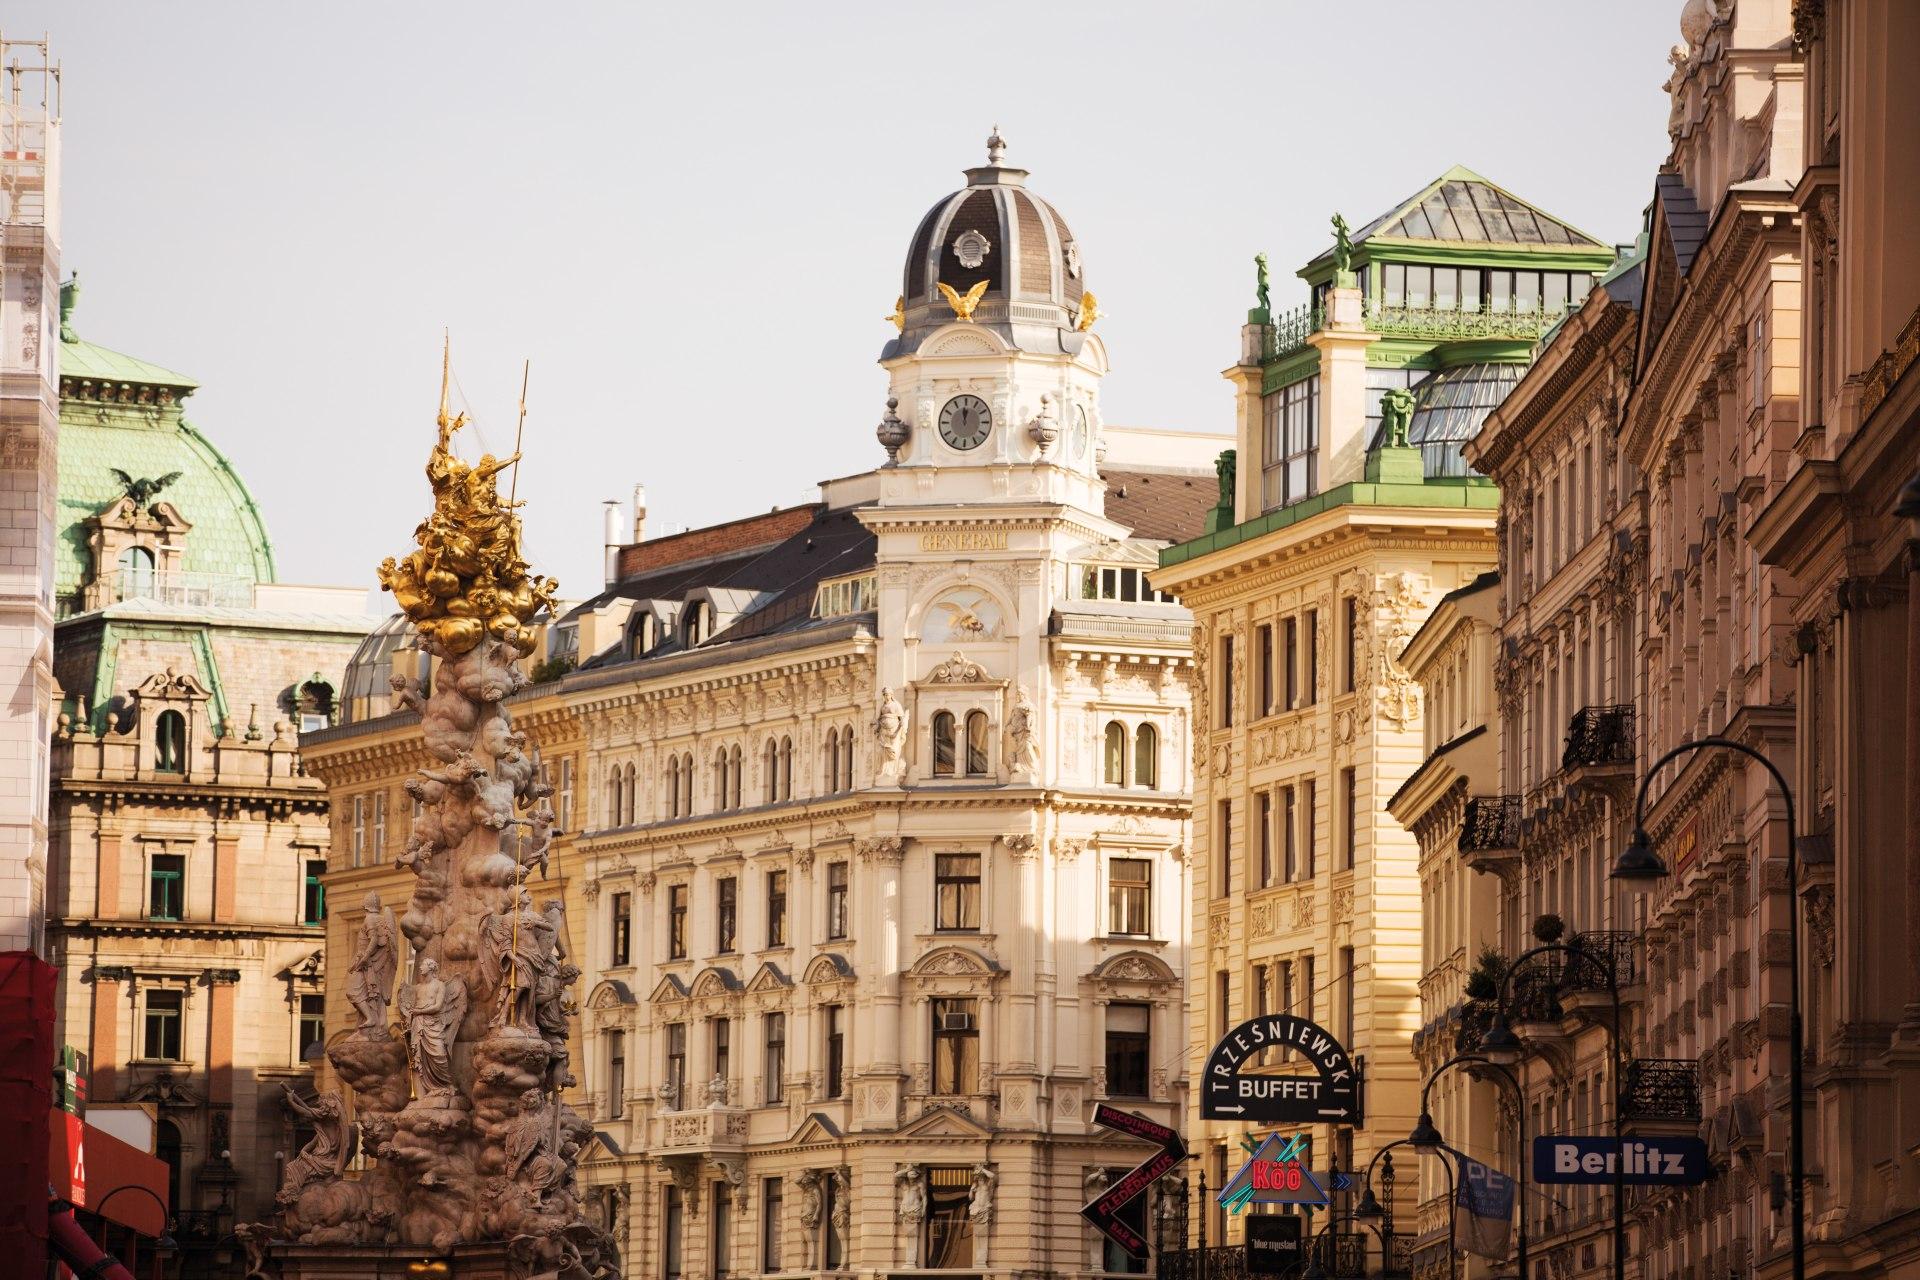 Wien Tourismus, 2016, copyright www.peterrigaud.com